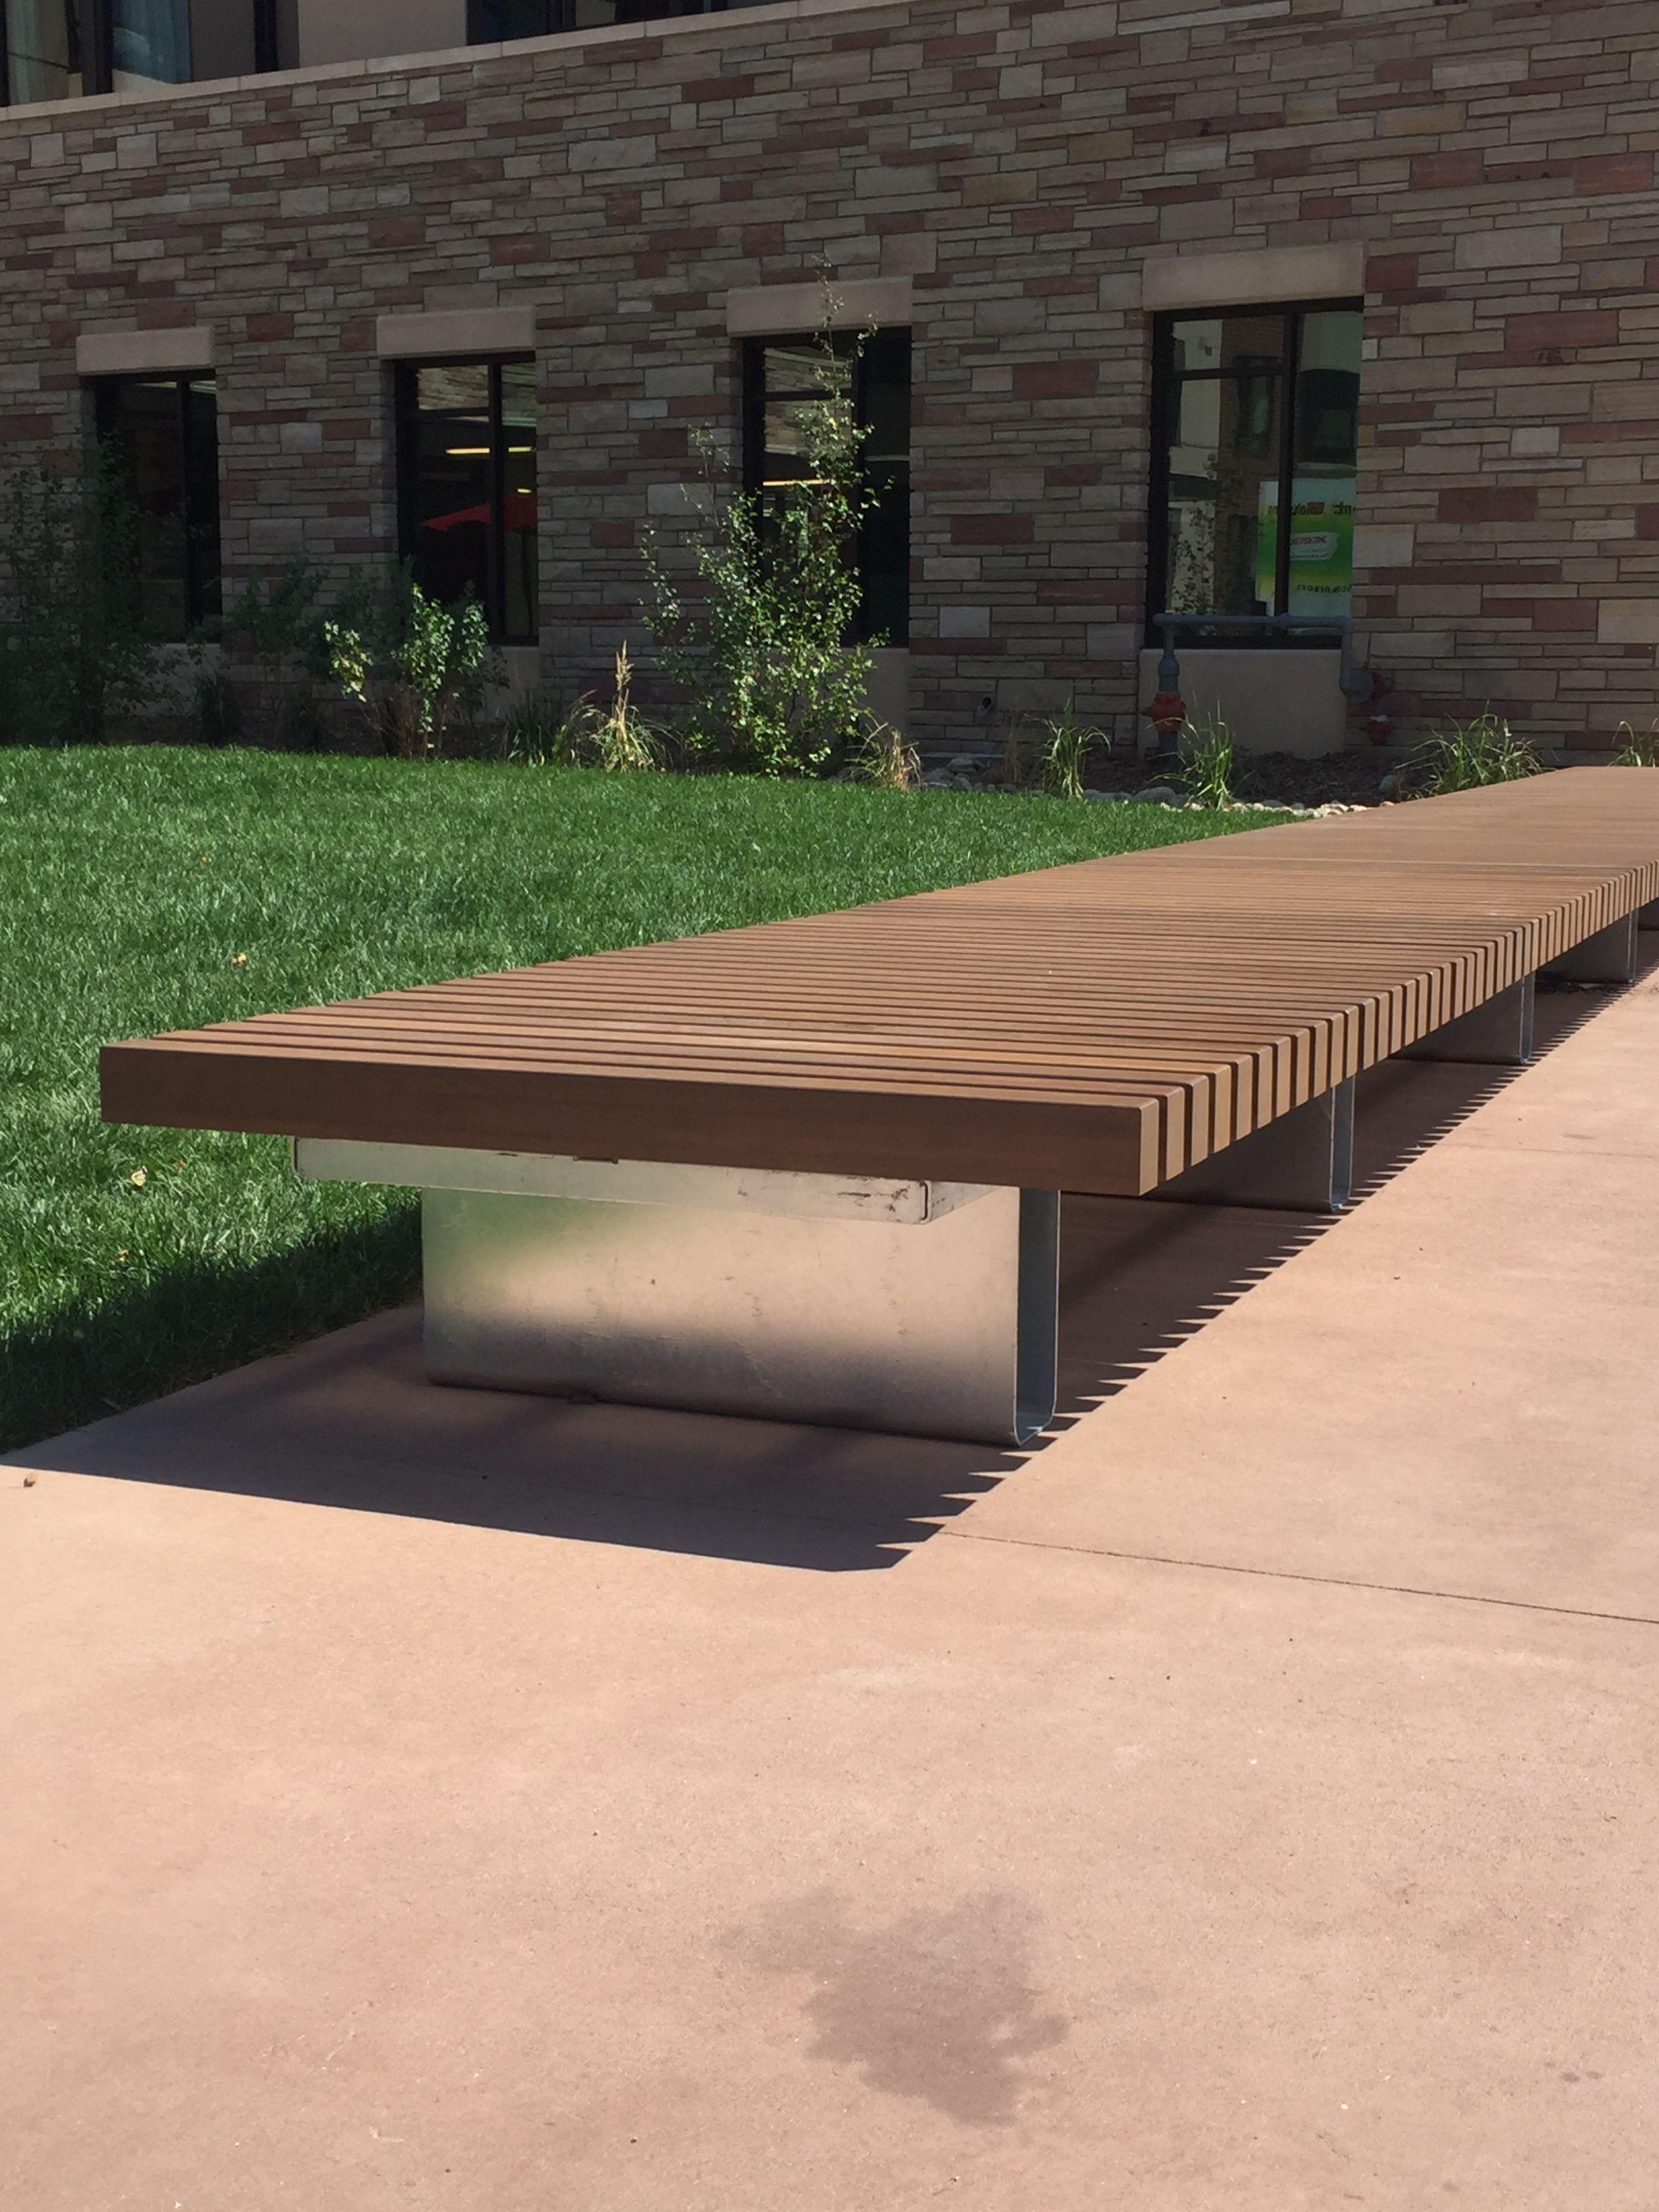 Superior Custom Benches Part - 13: Anova Custom Benches - Aggie Village @ Colorado State University